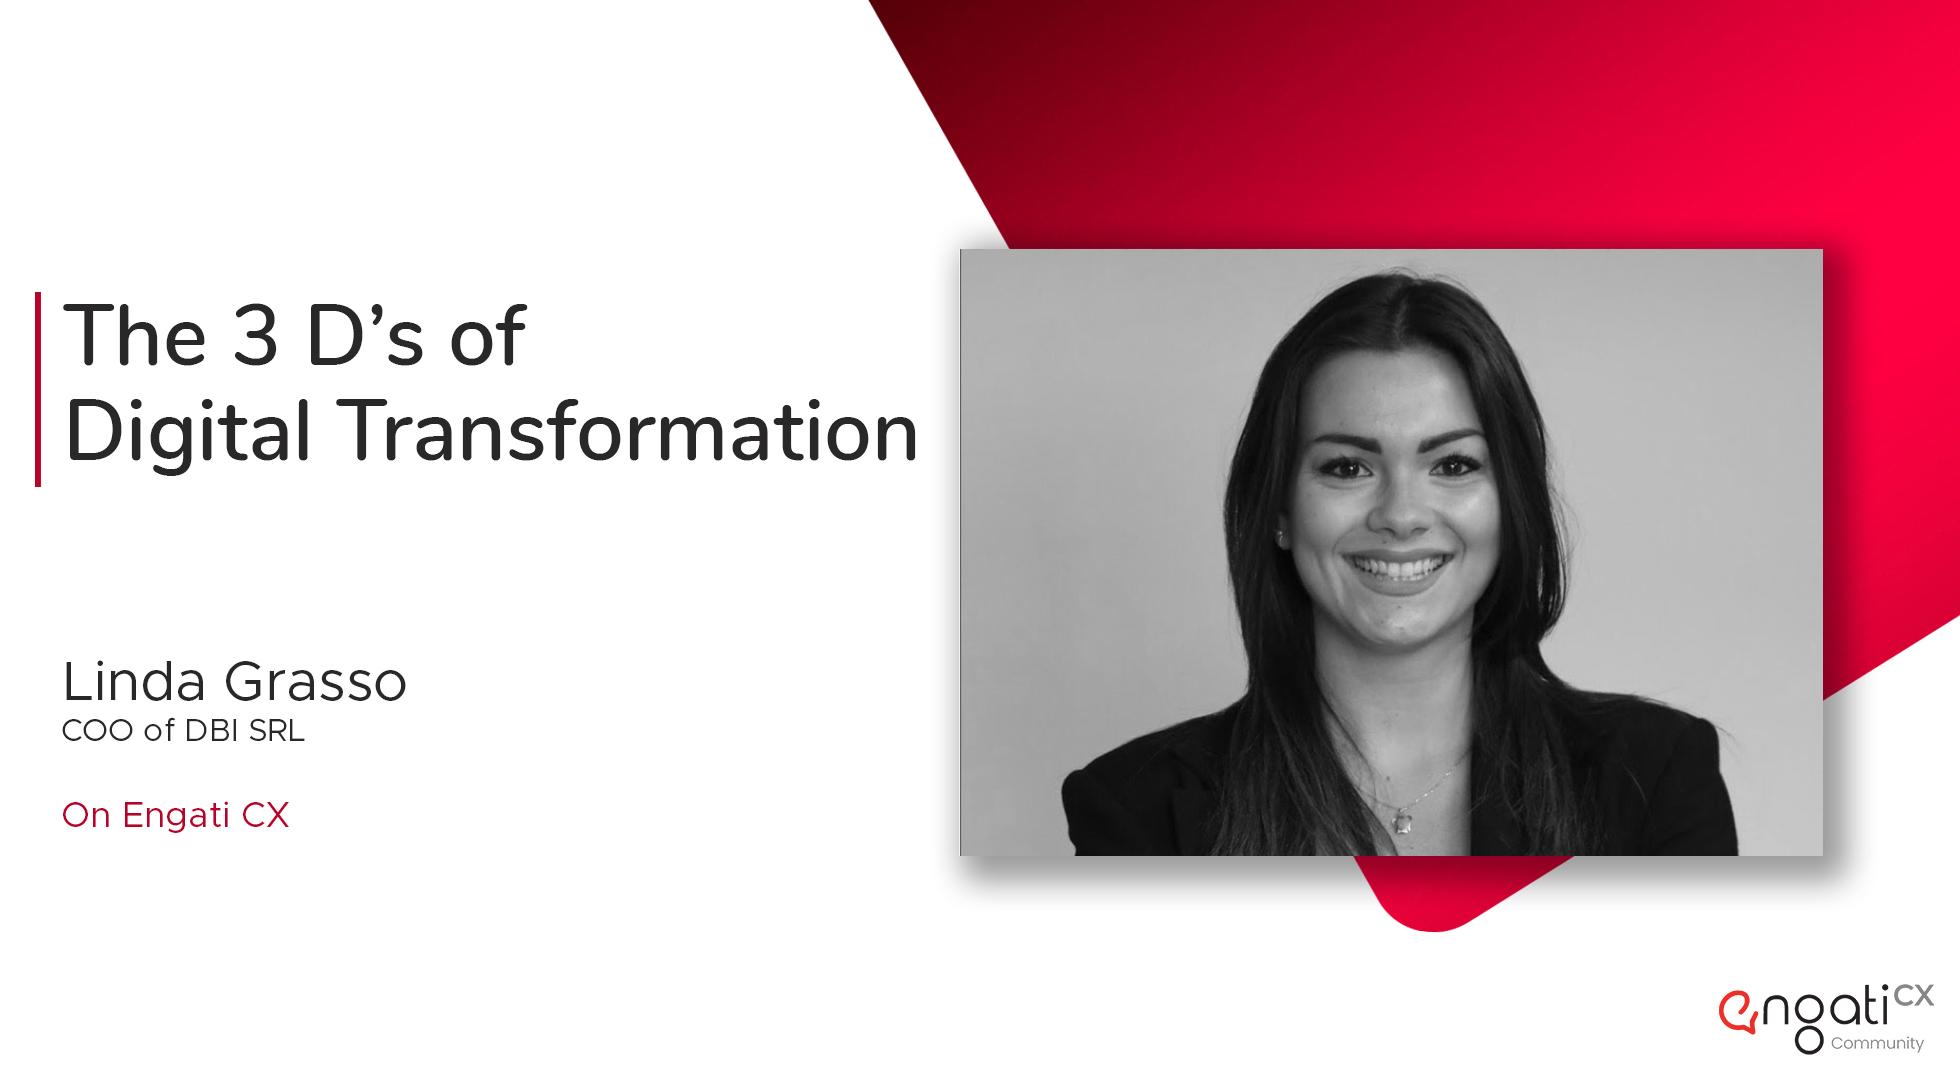 The 3 Ds of digital transformation - Linda Grasso on Engati CX